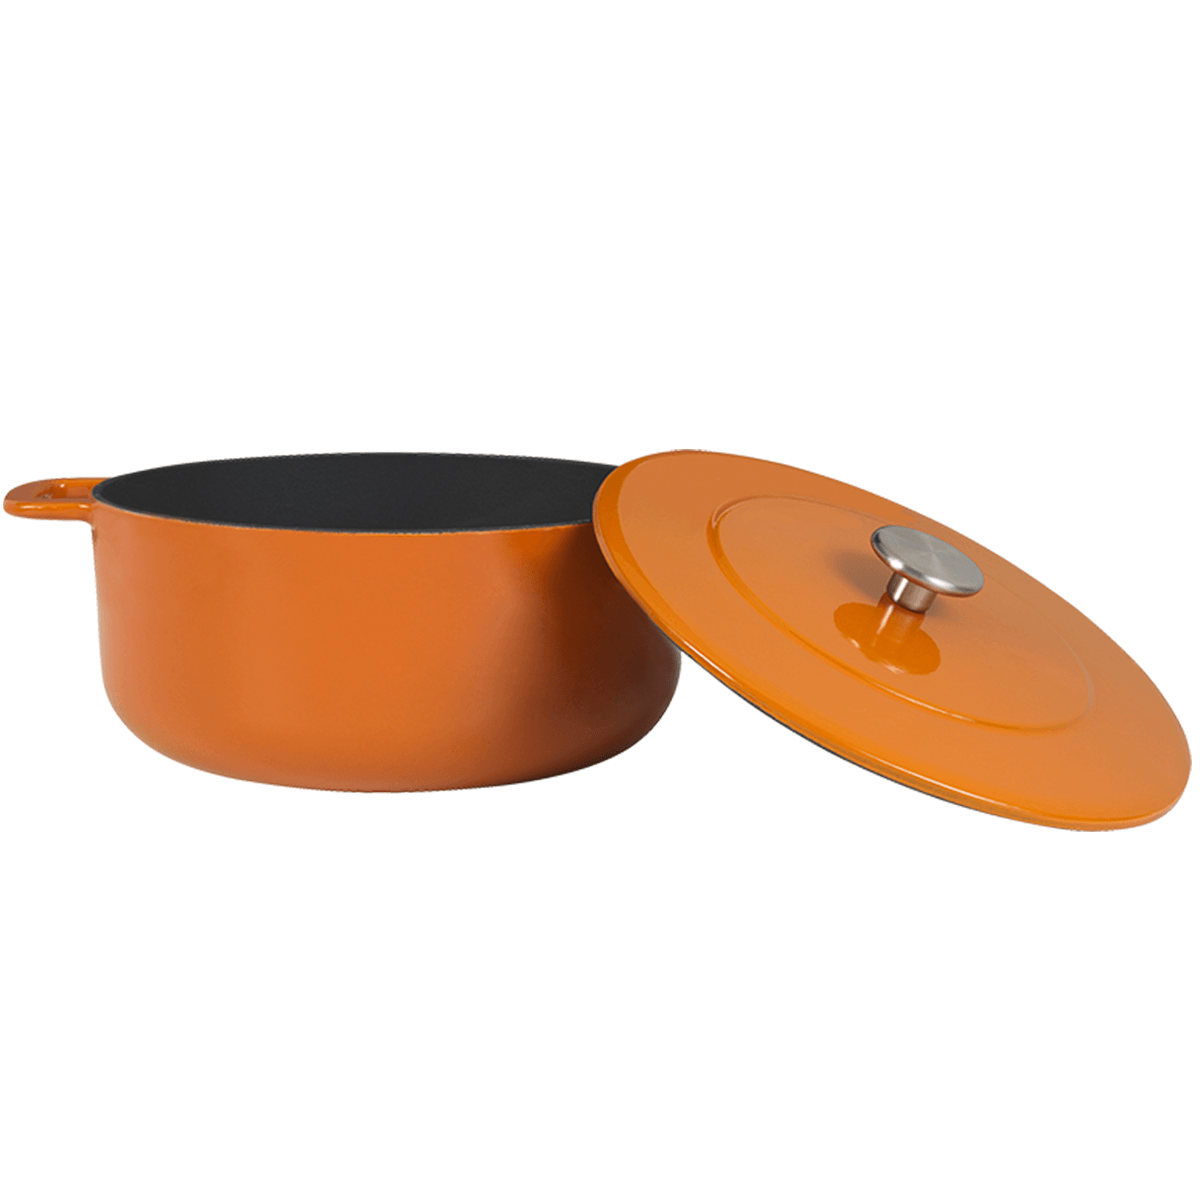 Sous-Chef Dutch Oven-2